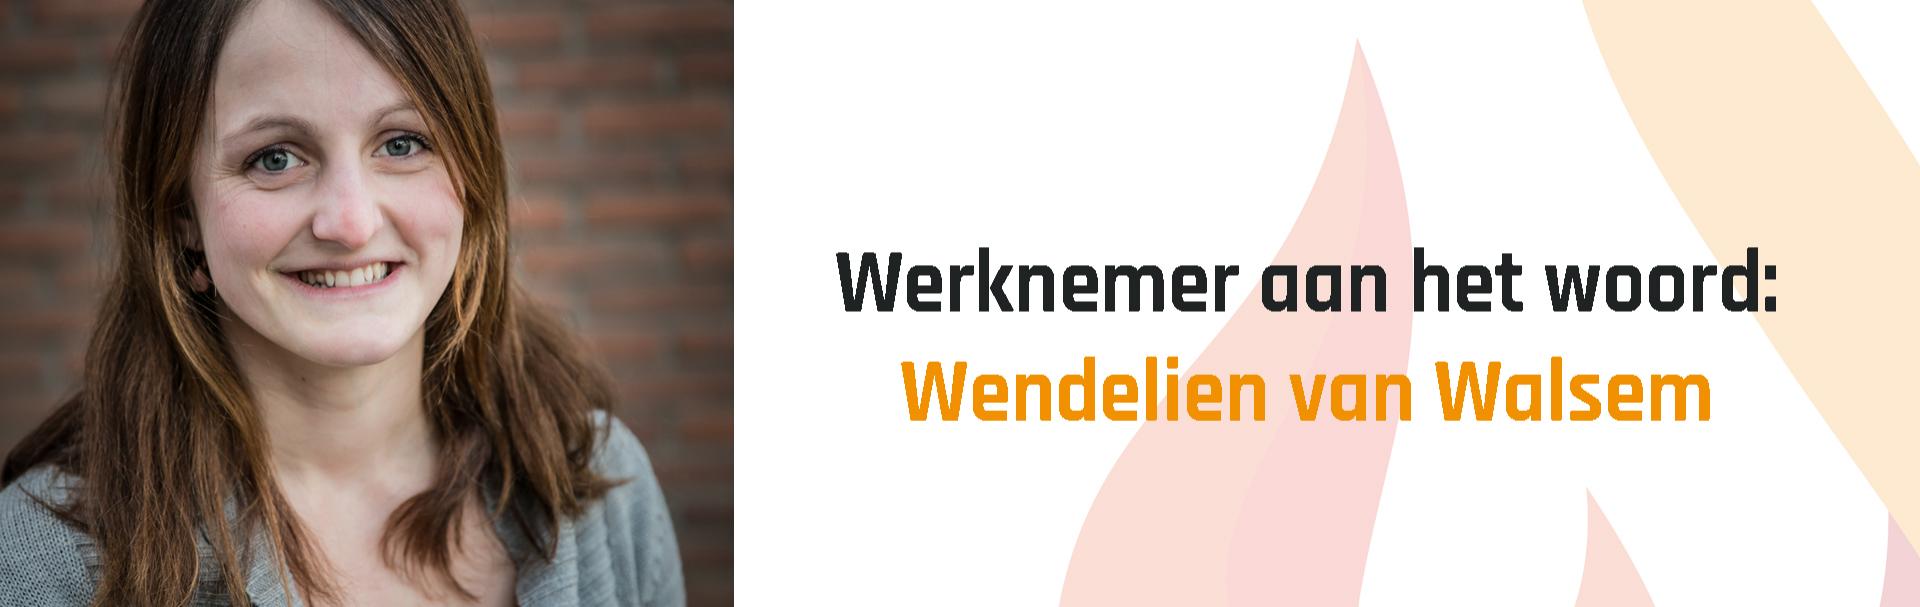 Werknemer aan het woord - Wendelien van Walsem